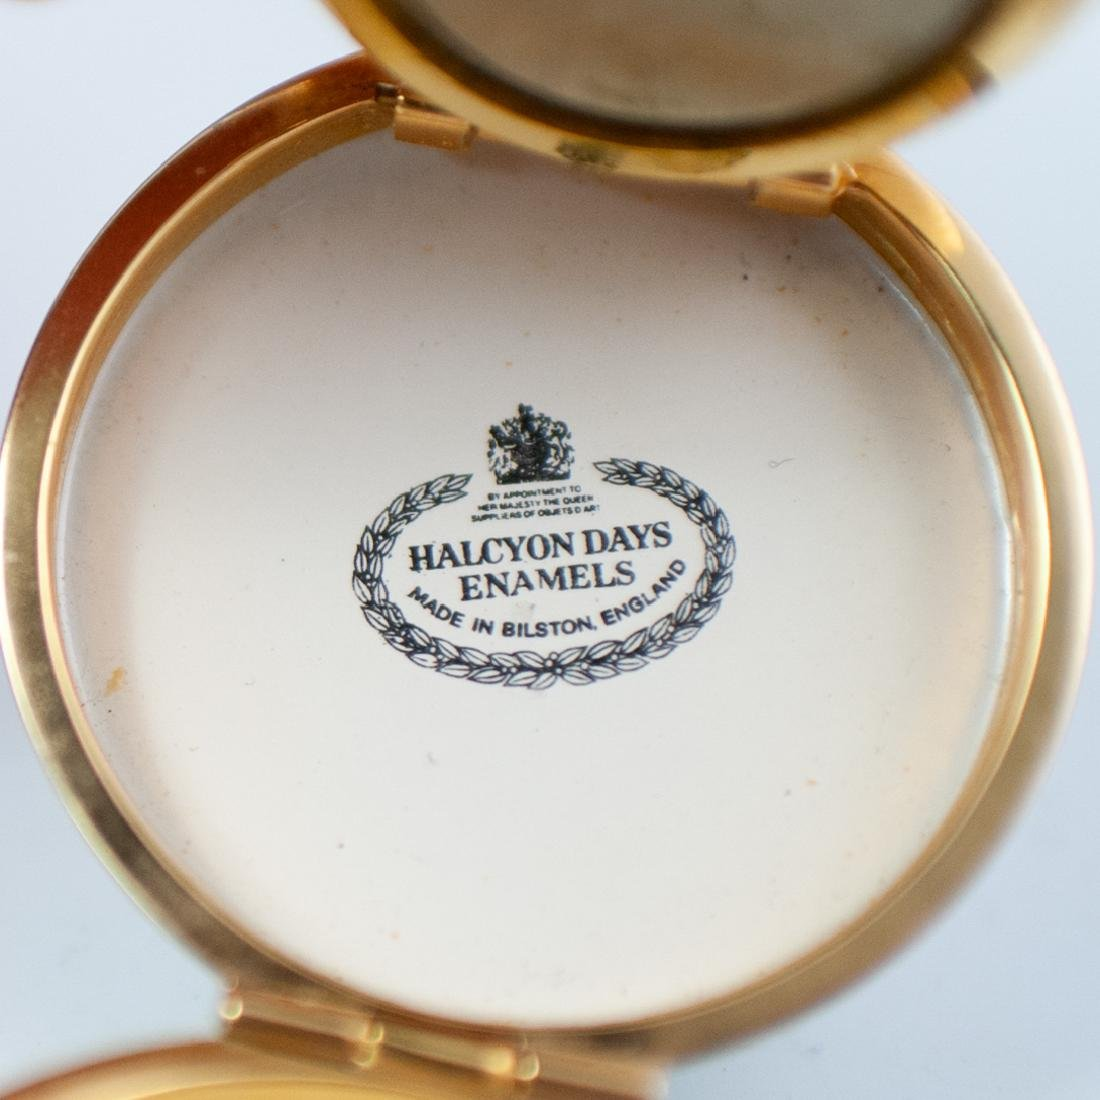 Halcyon Days Enamel Compact Watch - 2